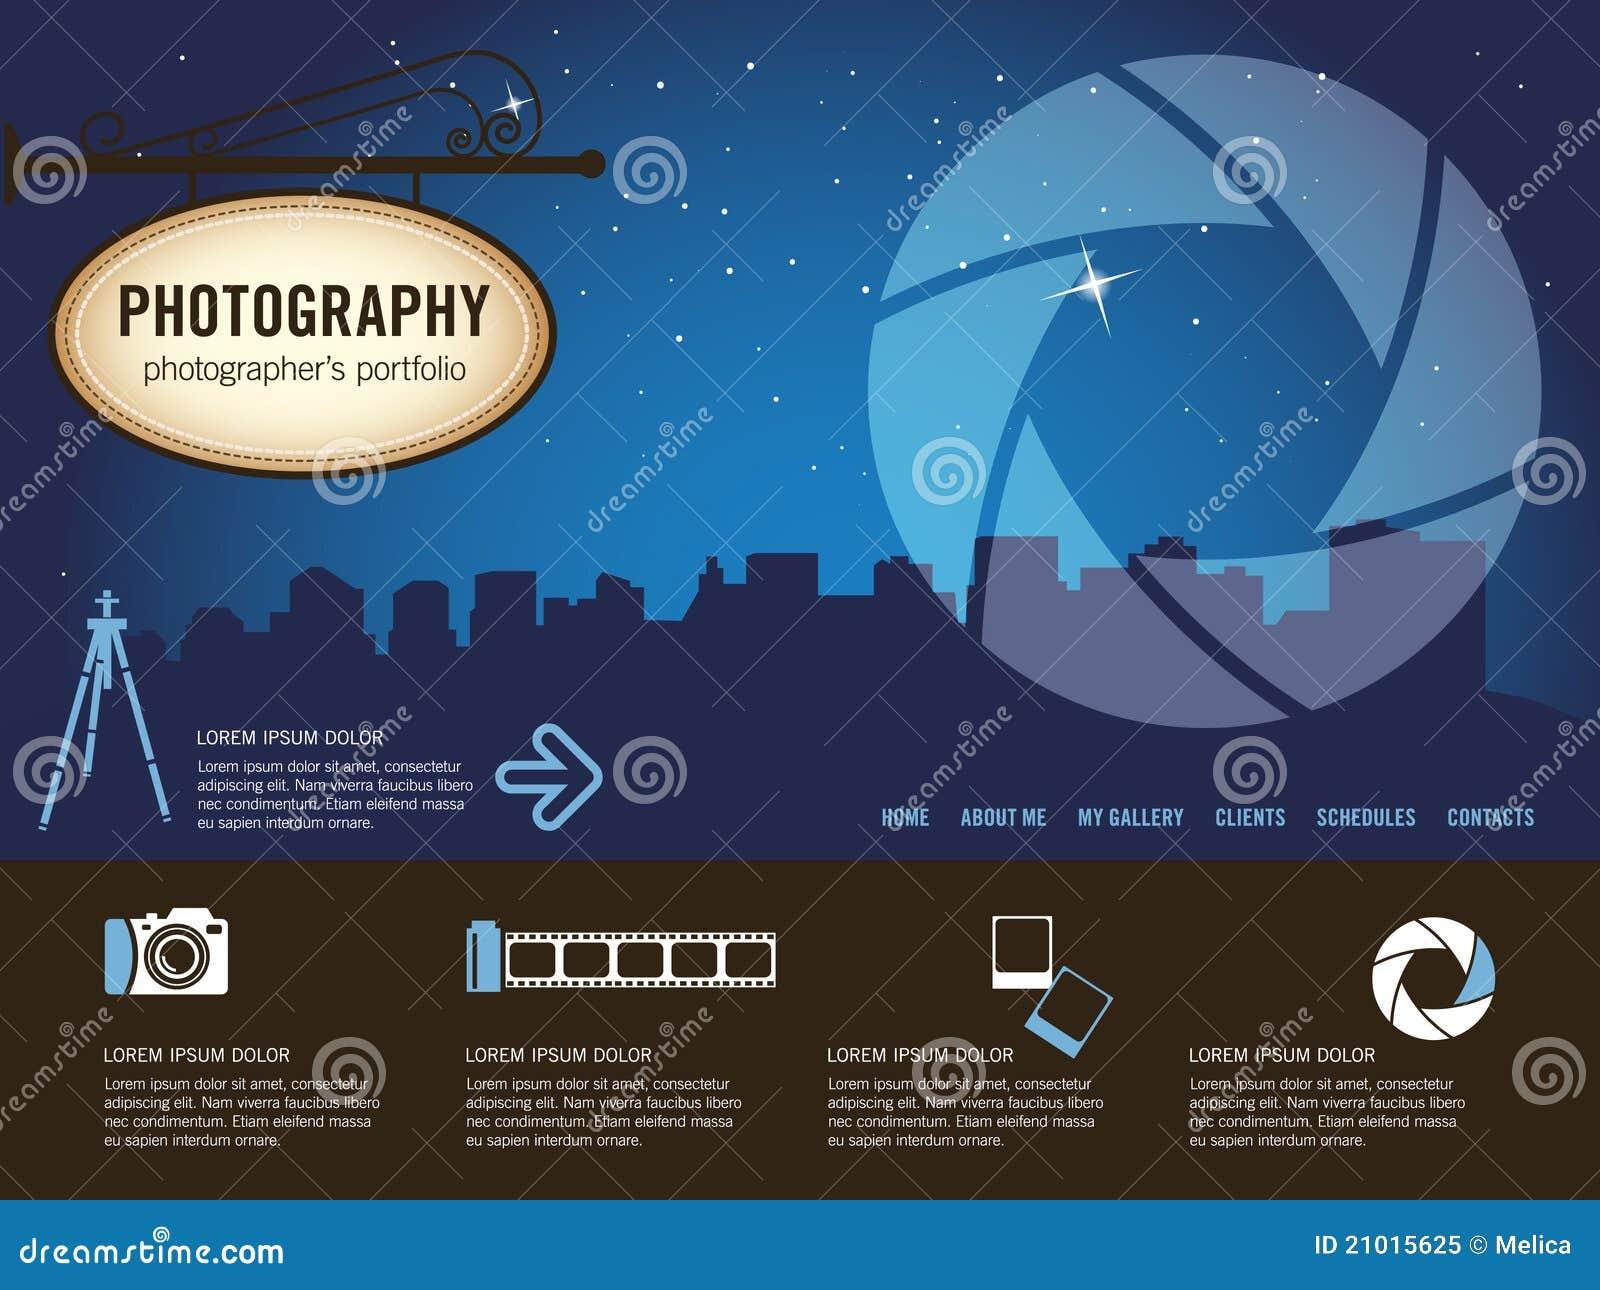 Photography Website Template Stock Vector Illustration Of - Photography website templates free download